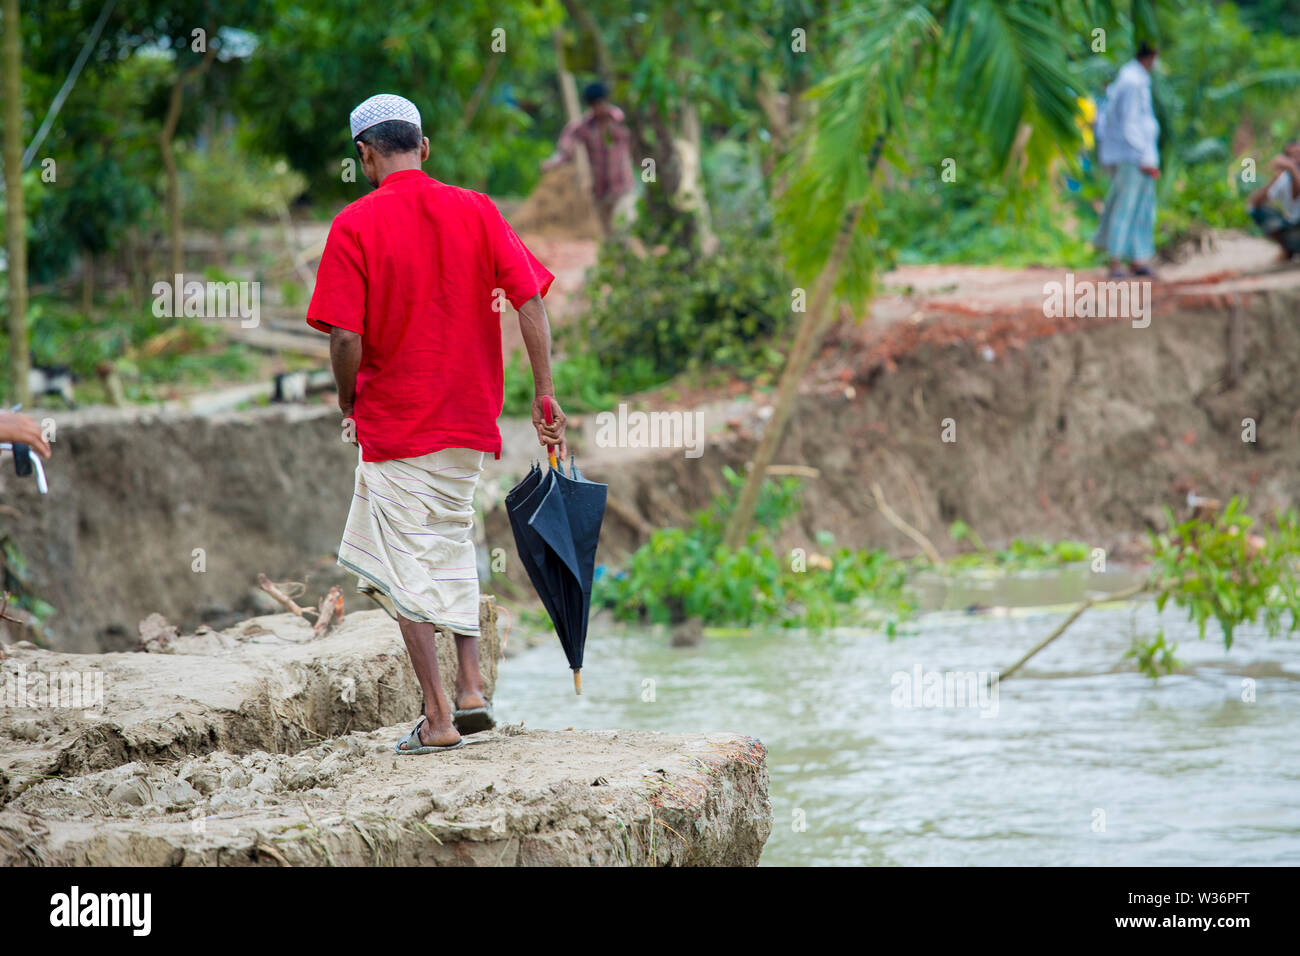 Bangladesh – June 27, 2015: Man woman and peoples are crossing river erosion affected roadside at Rasulpur, Barisal District. - Stock Image